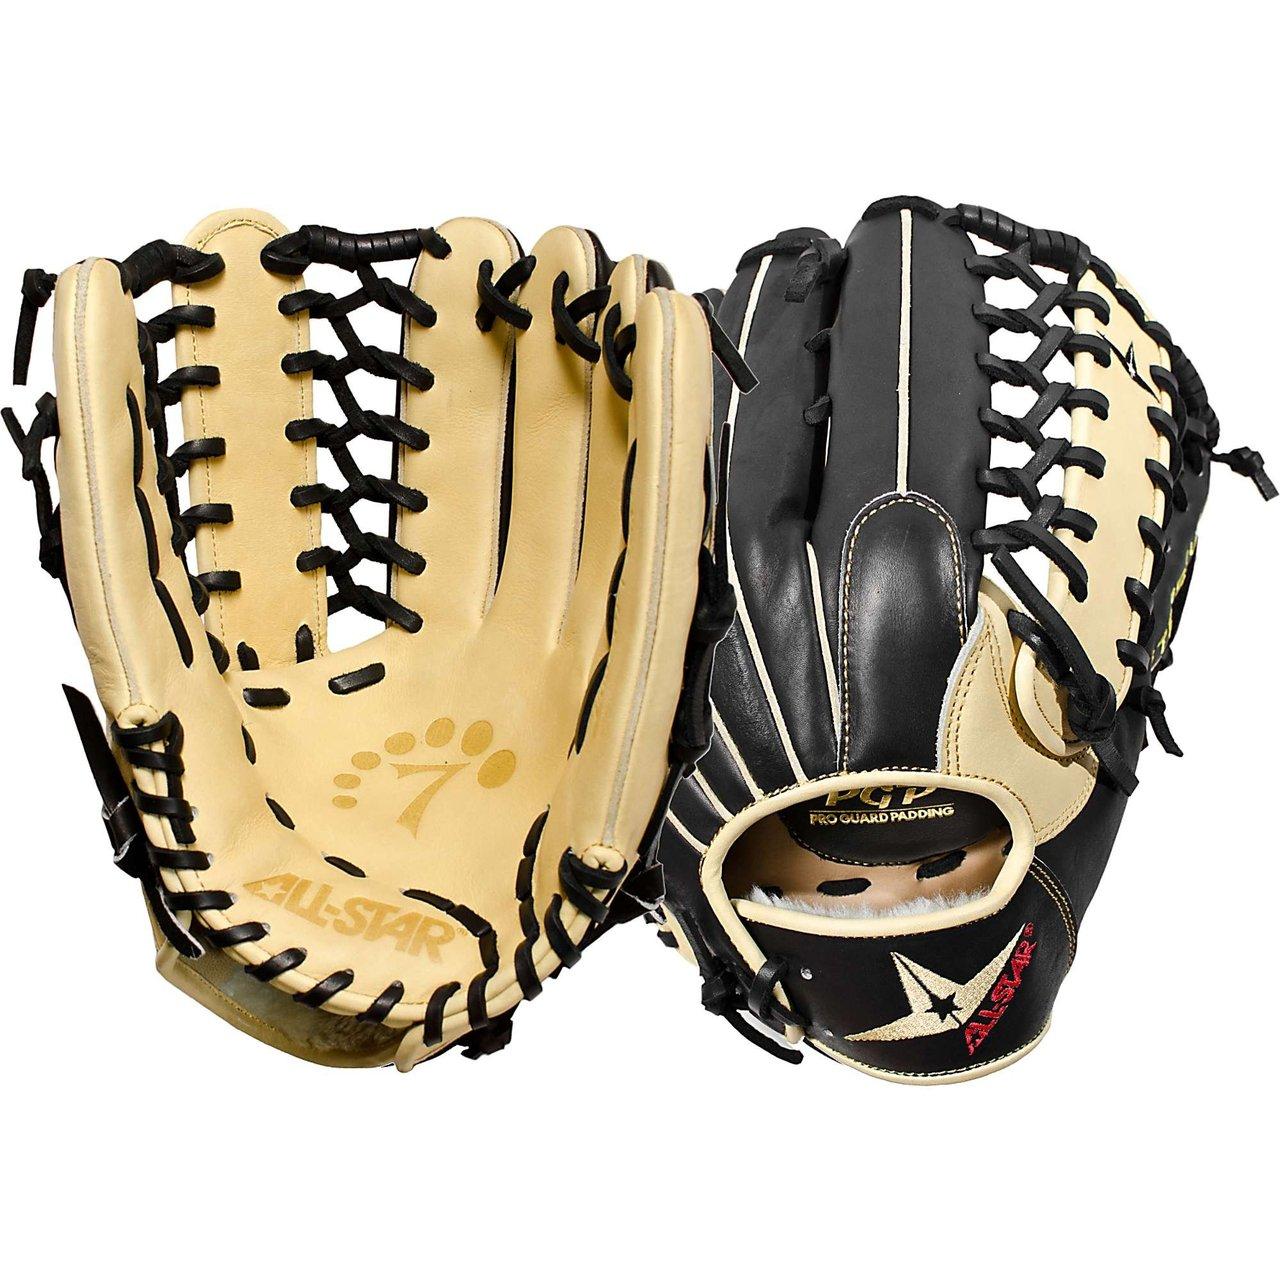 all-star-system-seven-fgs7-of-baseball-glove-12-5-inch-right-handed-throw FGS7-OF-Right Handed Throw All-Star 029343027291 All Star System Seven FGS7-OF Baseball Glove 12.5 Inch Right Handed